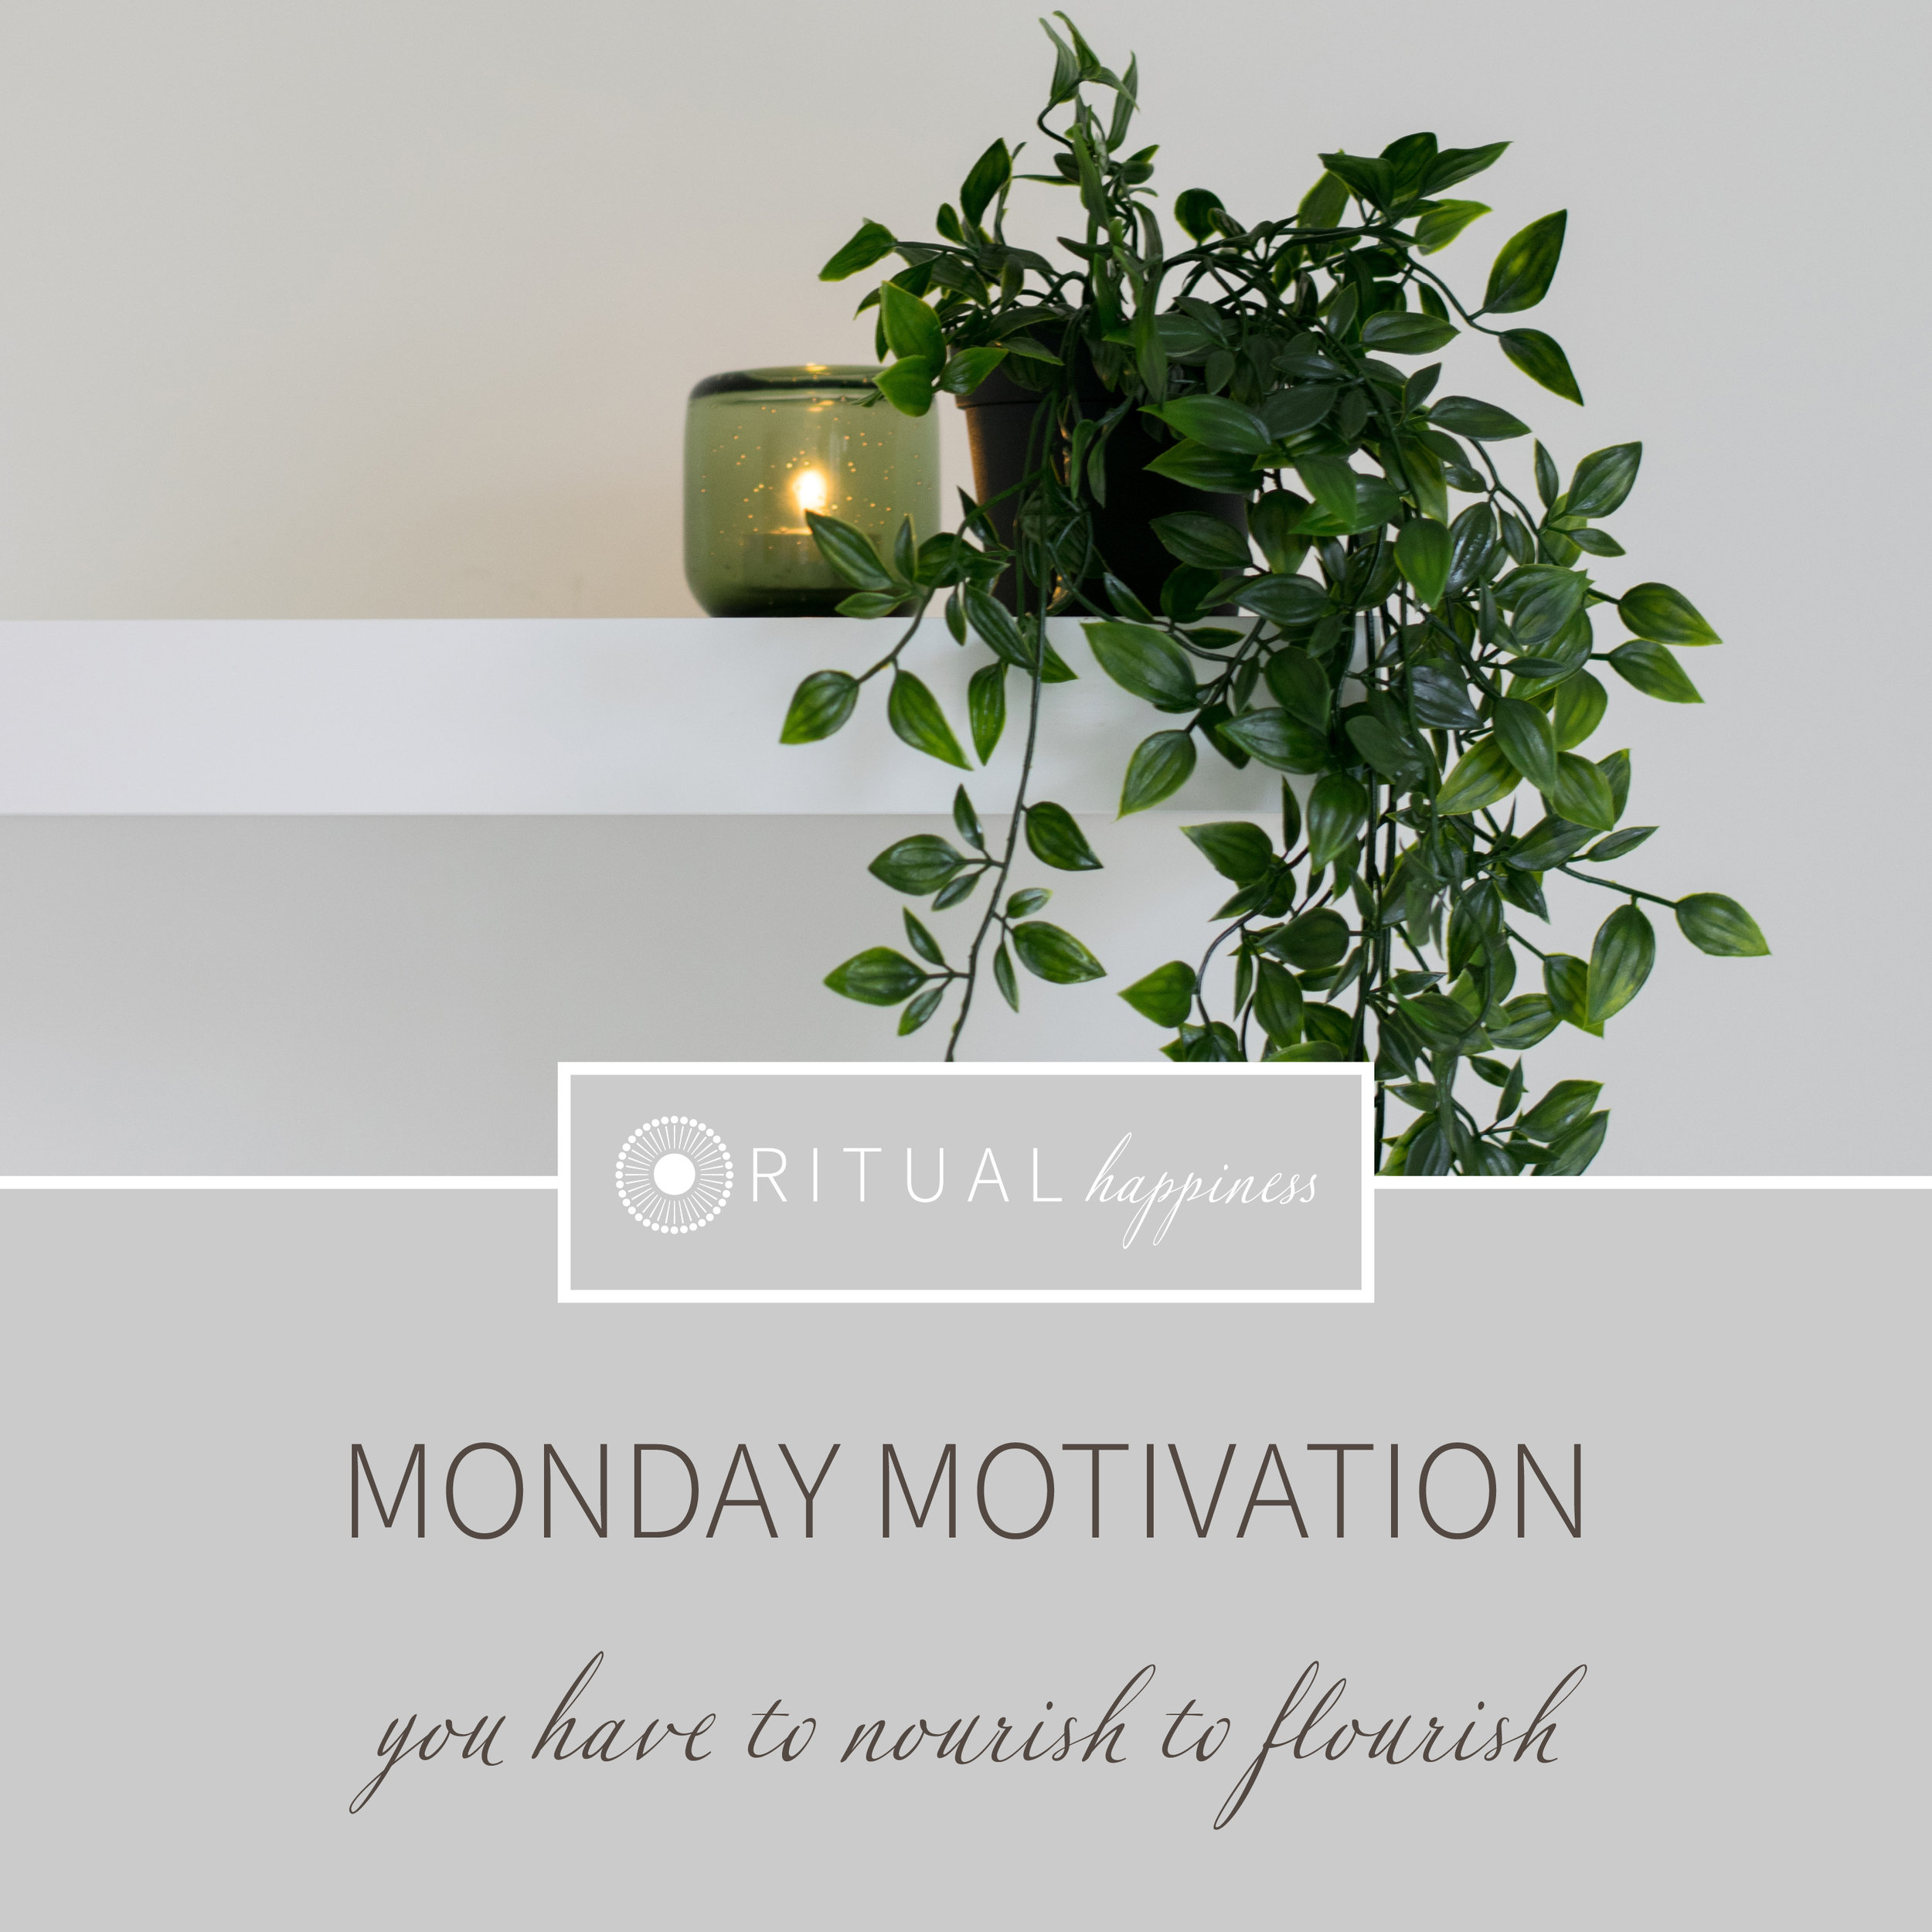 MondayMotivation_nourishtoFlourish.jpg